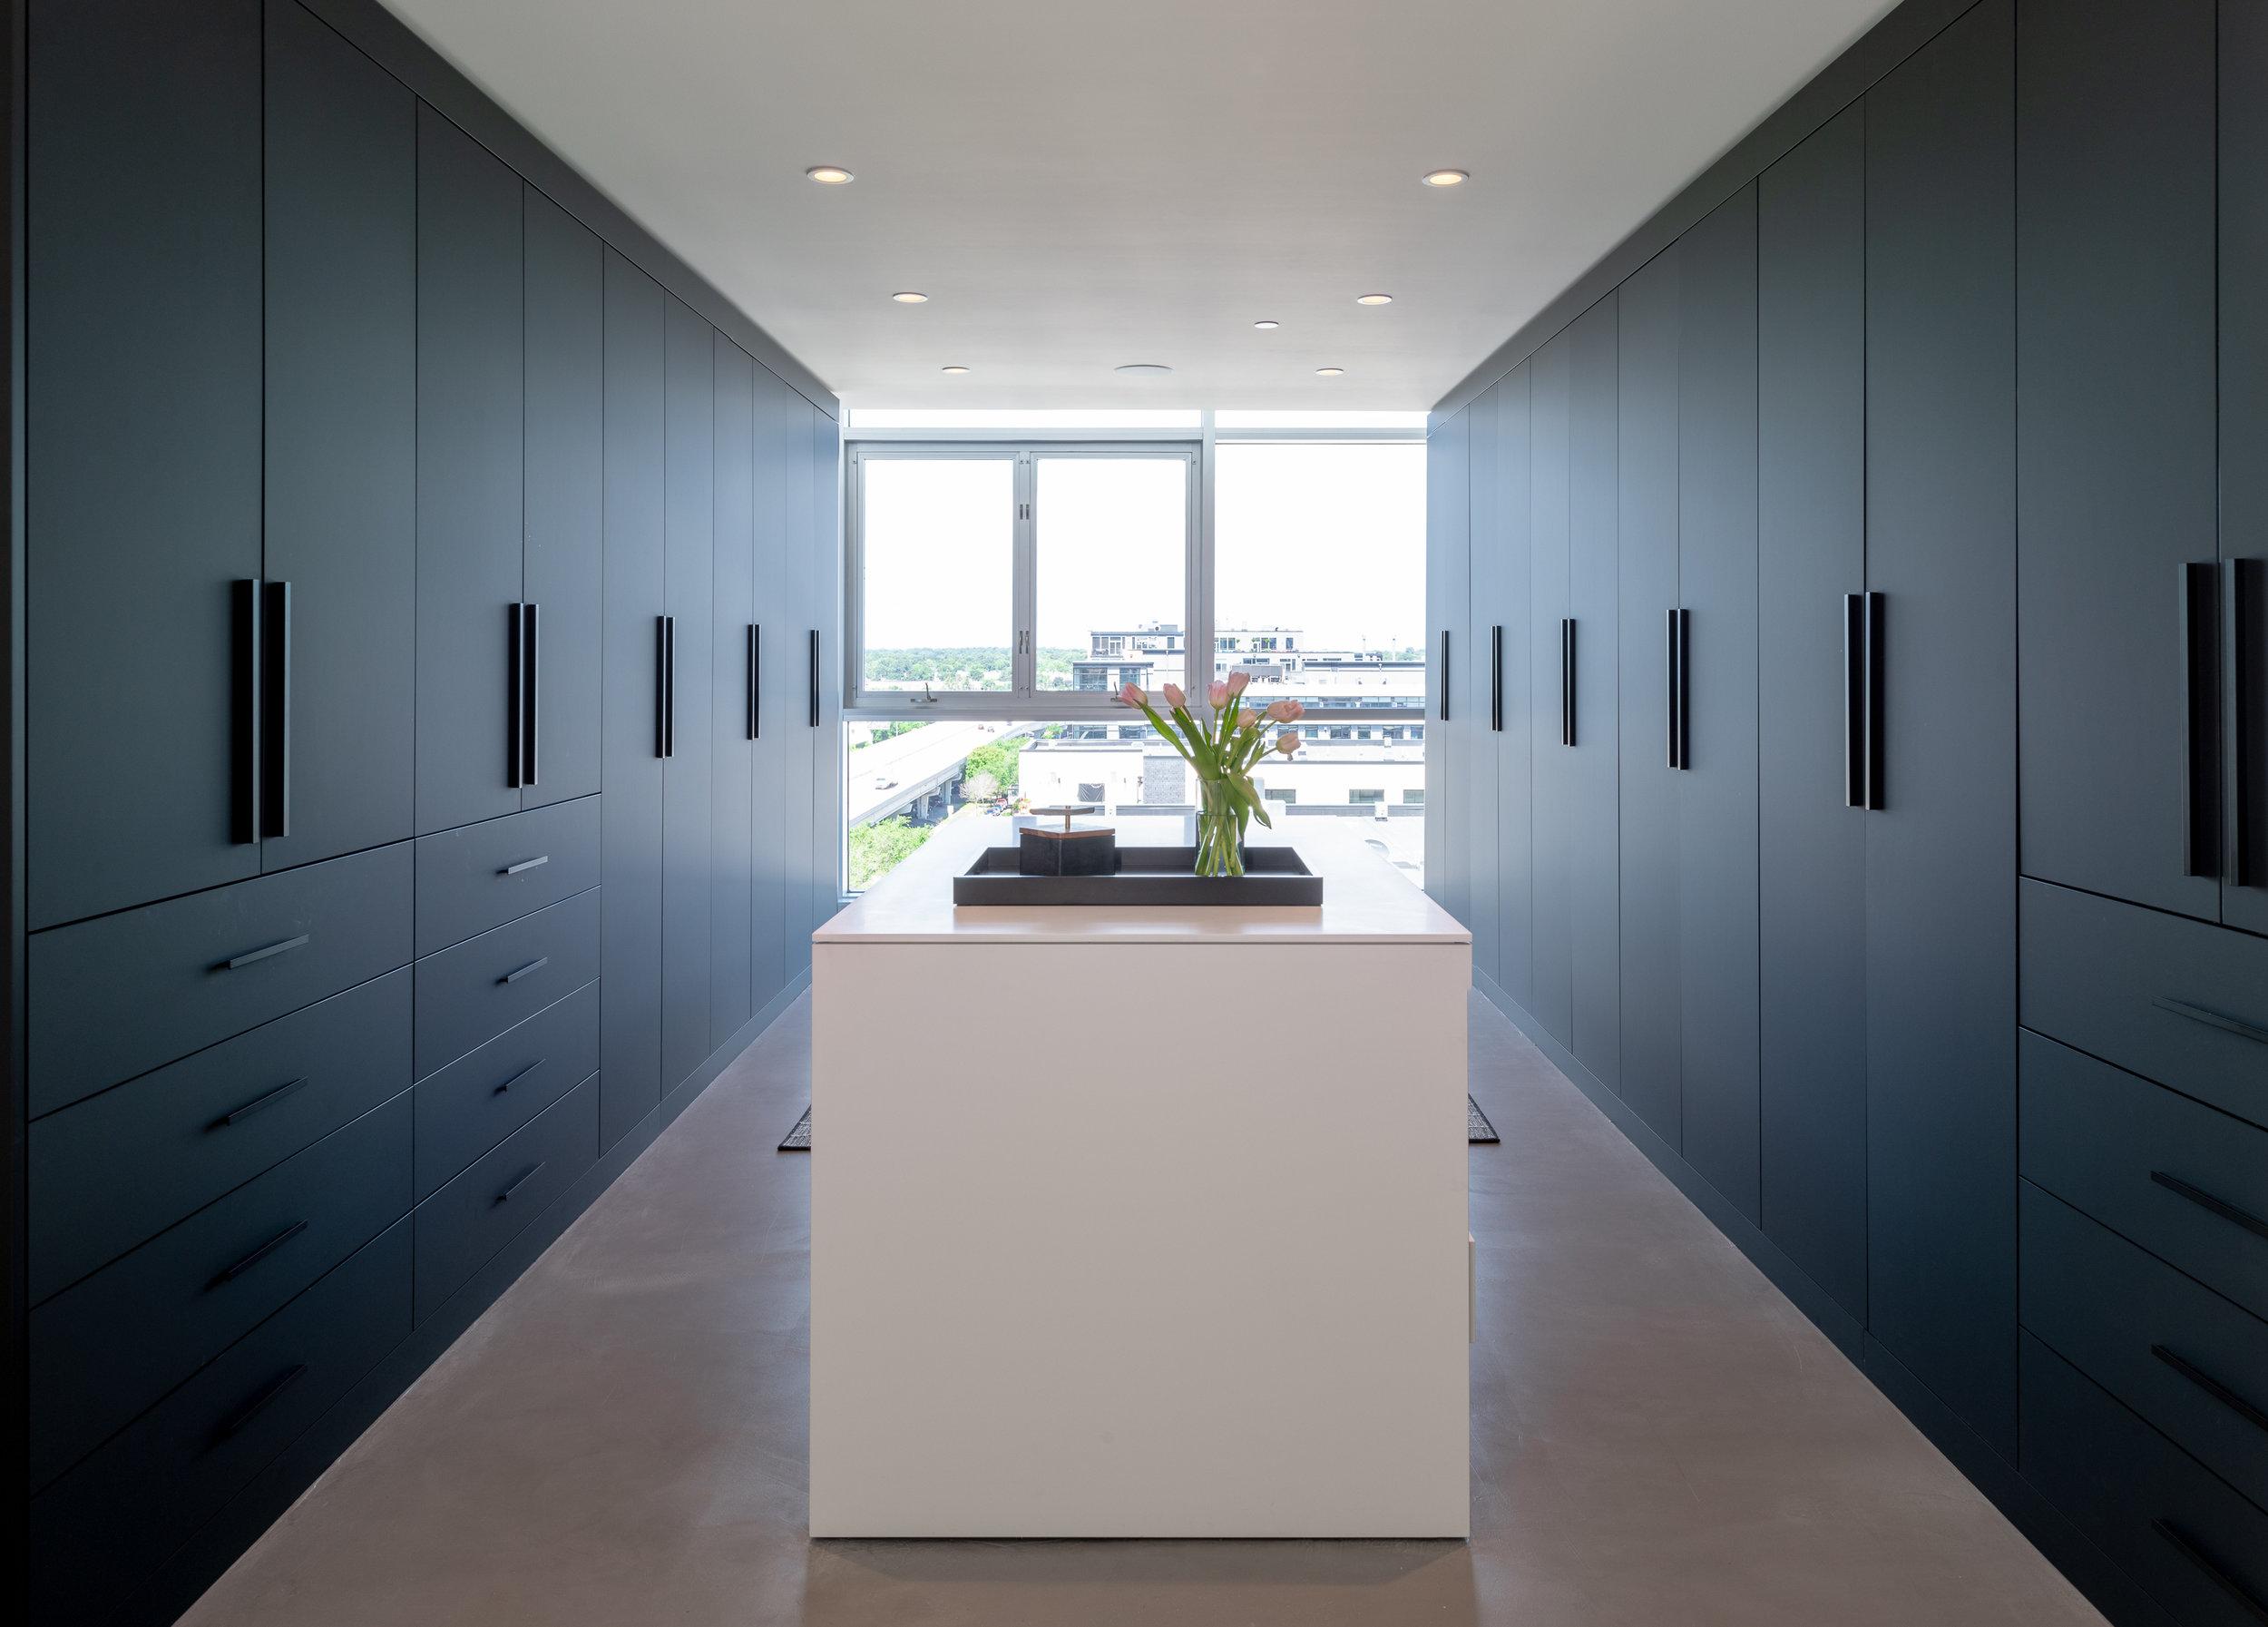 Custom monochrome closet cabinetry